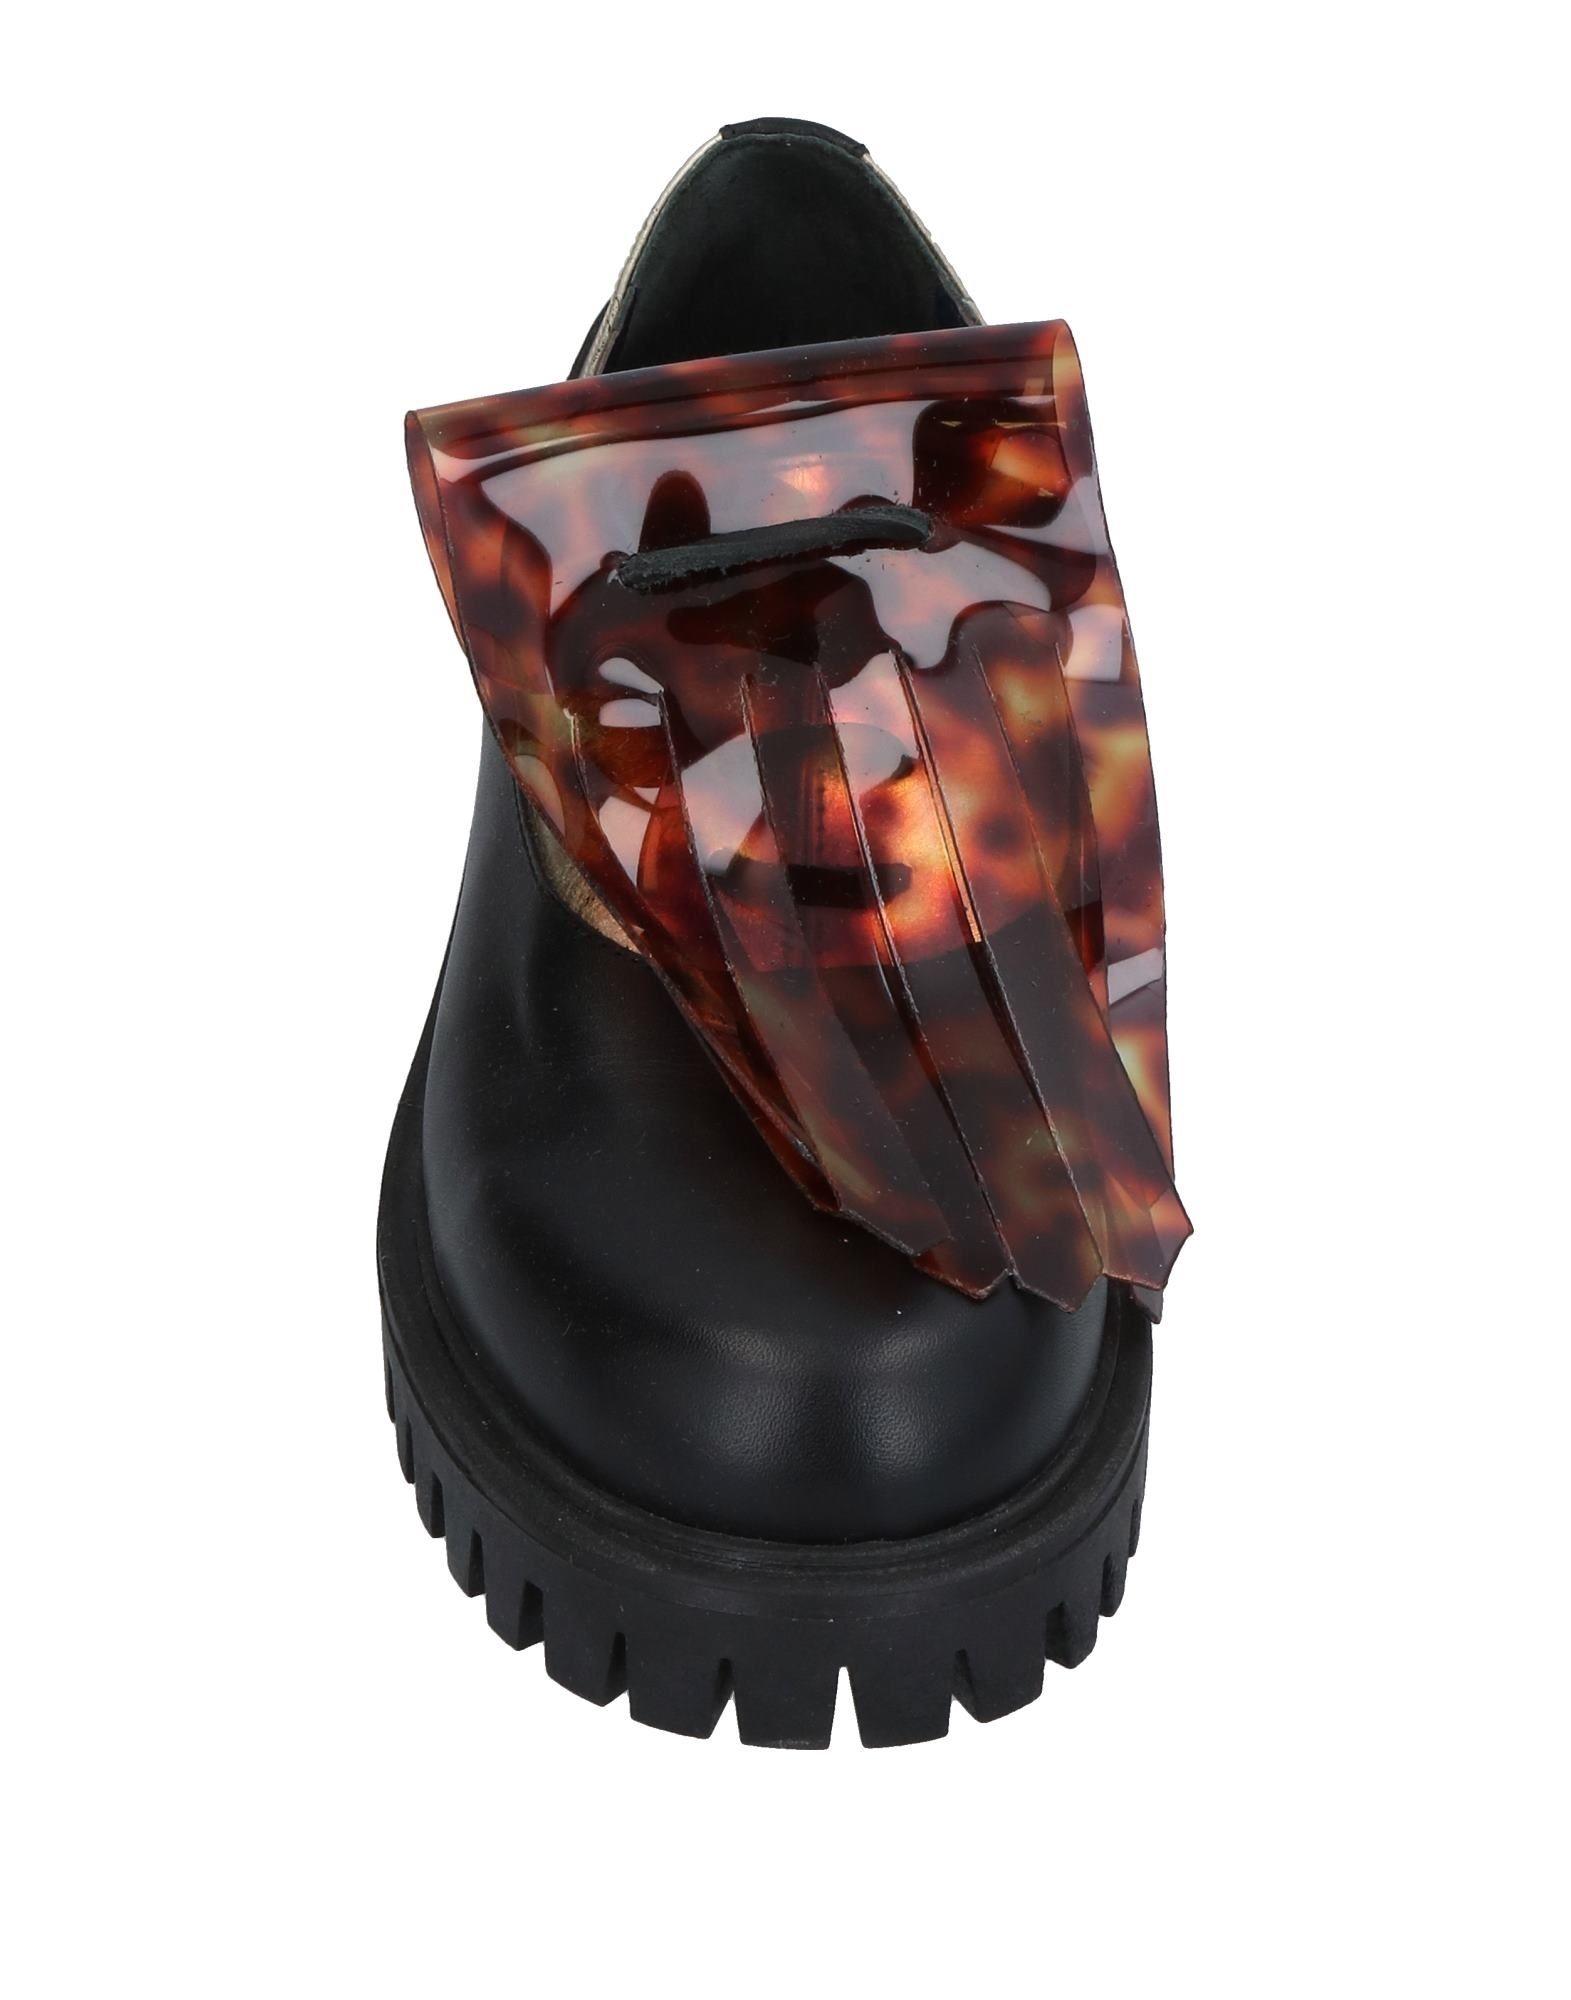 Gut um billige Schuhe Damen zu tragenStudio Pollini Schnürschuhe Damen Schuhe  11371957JK 714ad2